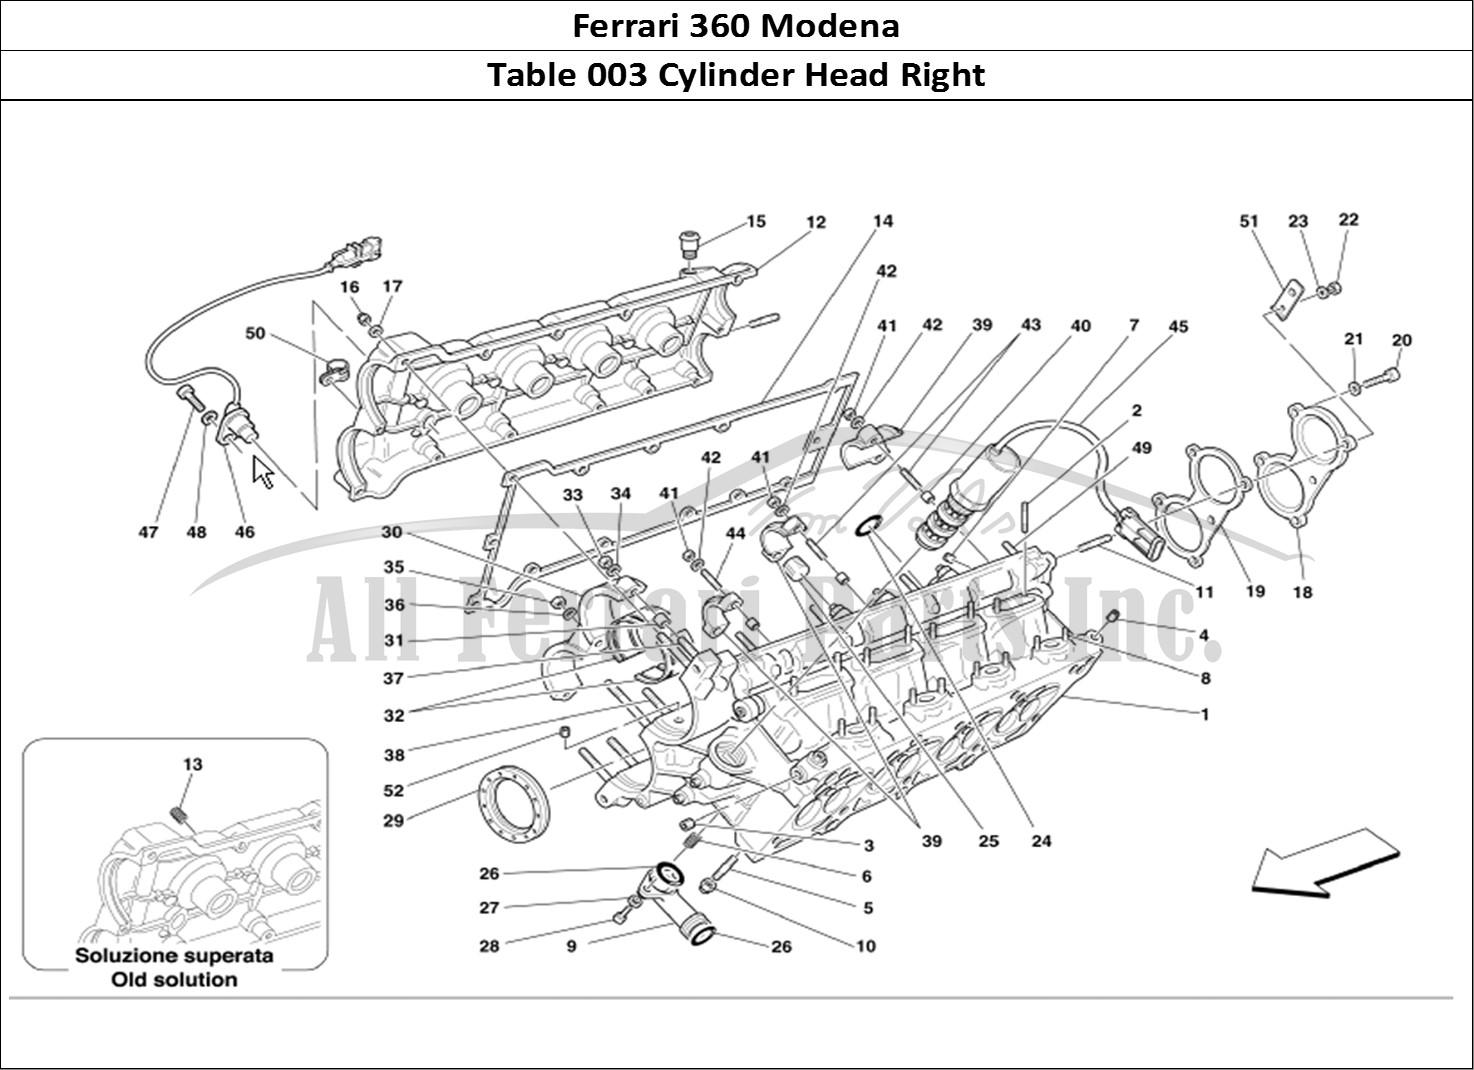 Buy original Ferrari 360 Modena 003 Cylinder Head Right